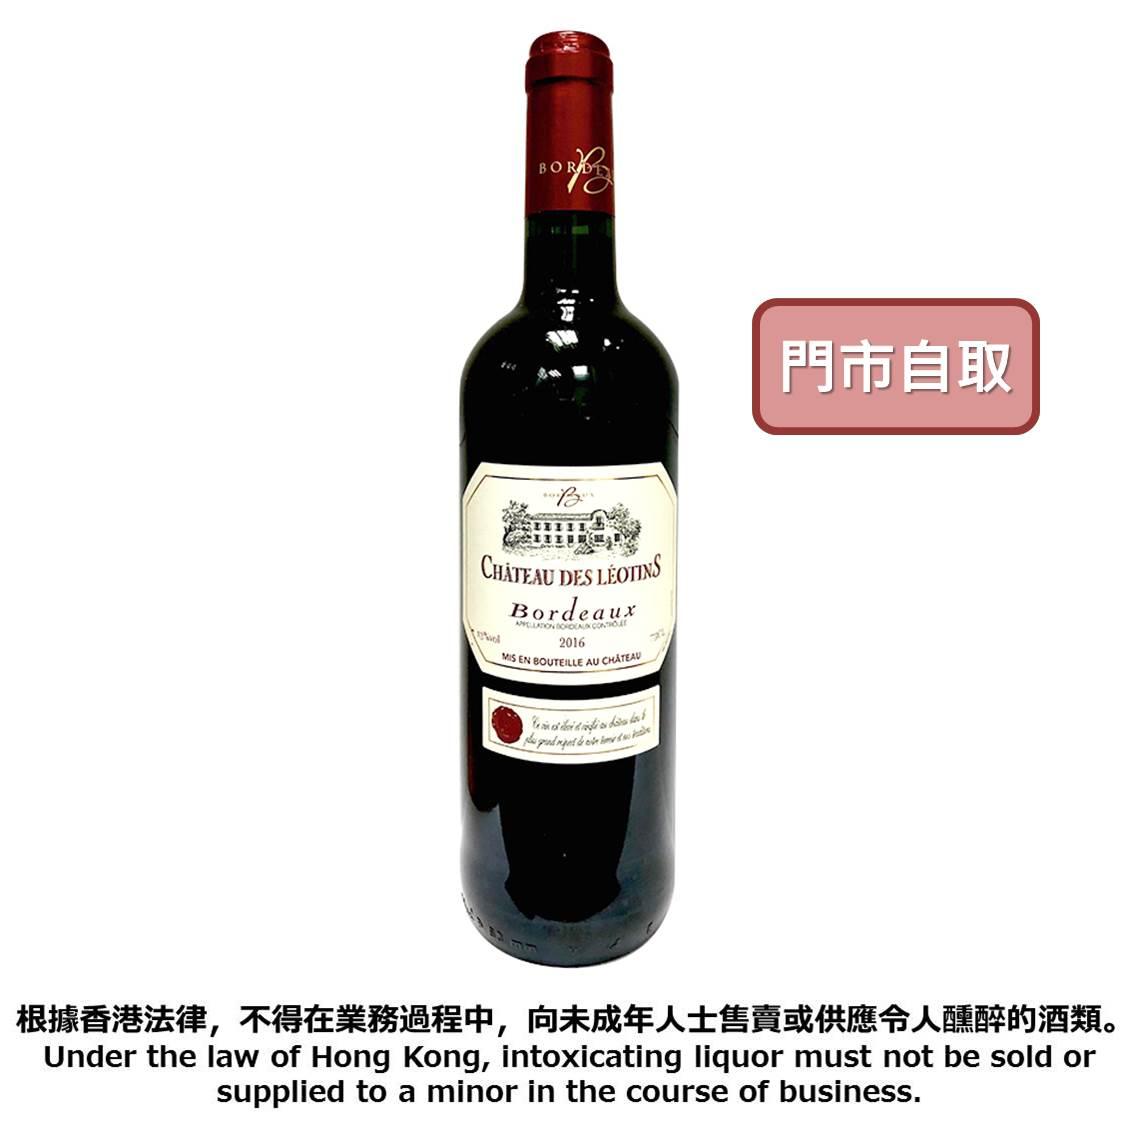 CH DES LEOTINS波爾多紅酒